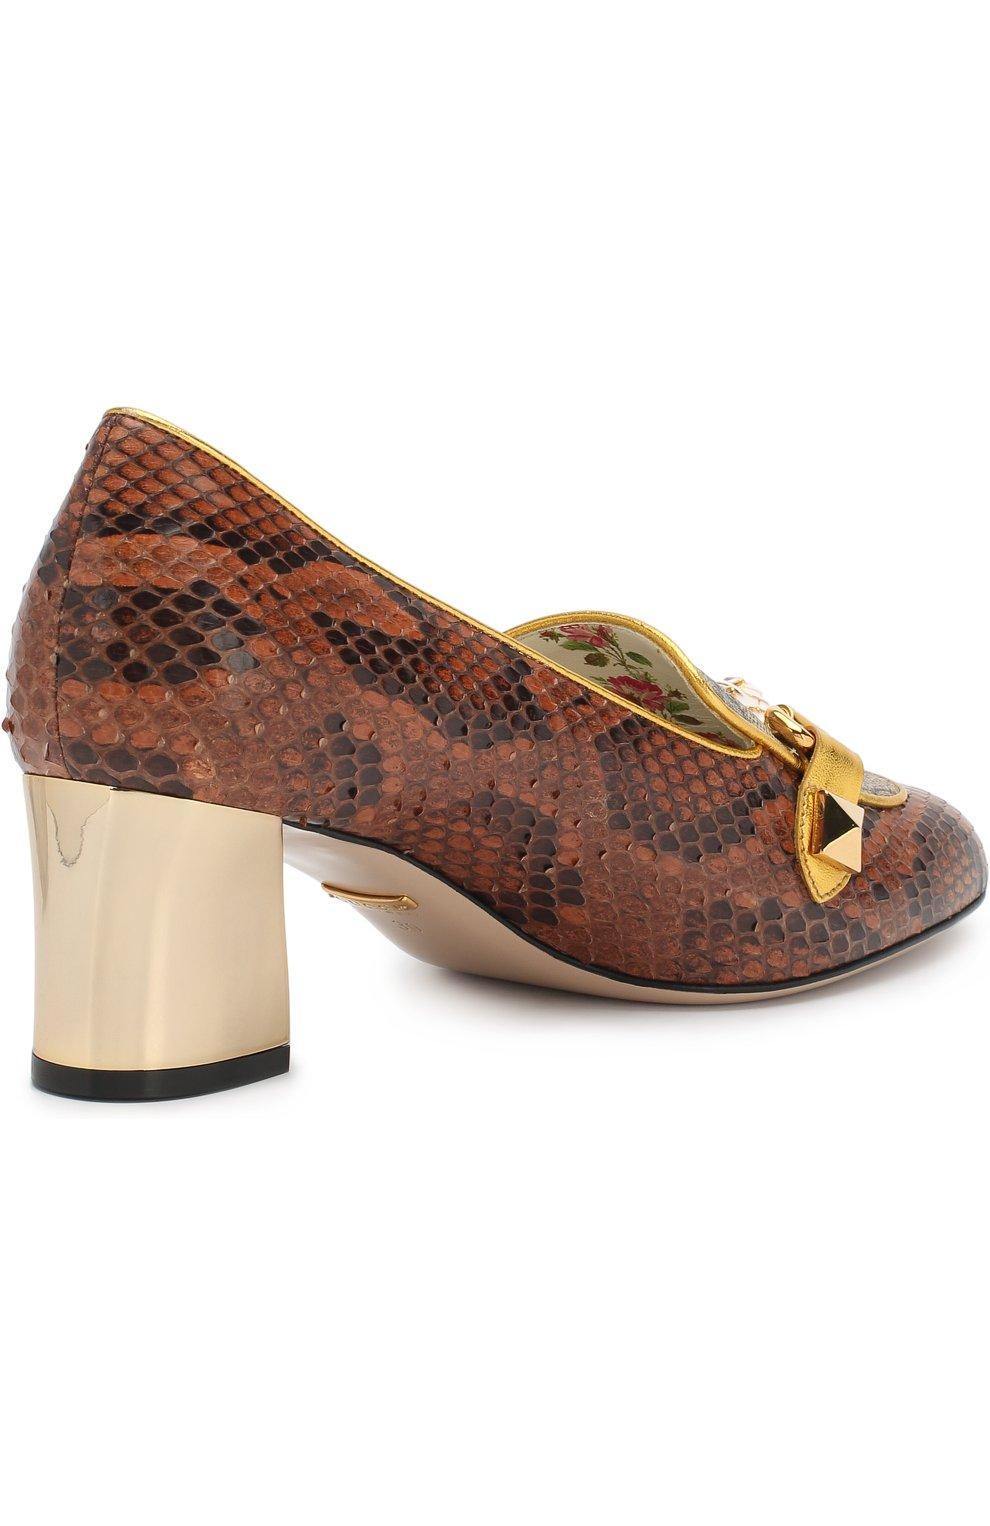 Женские туфли из кожи питона на устойчивом каблуке GUCCI коричневого цвета, арт. 498882/LU030 | Фото 4